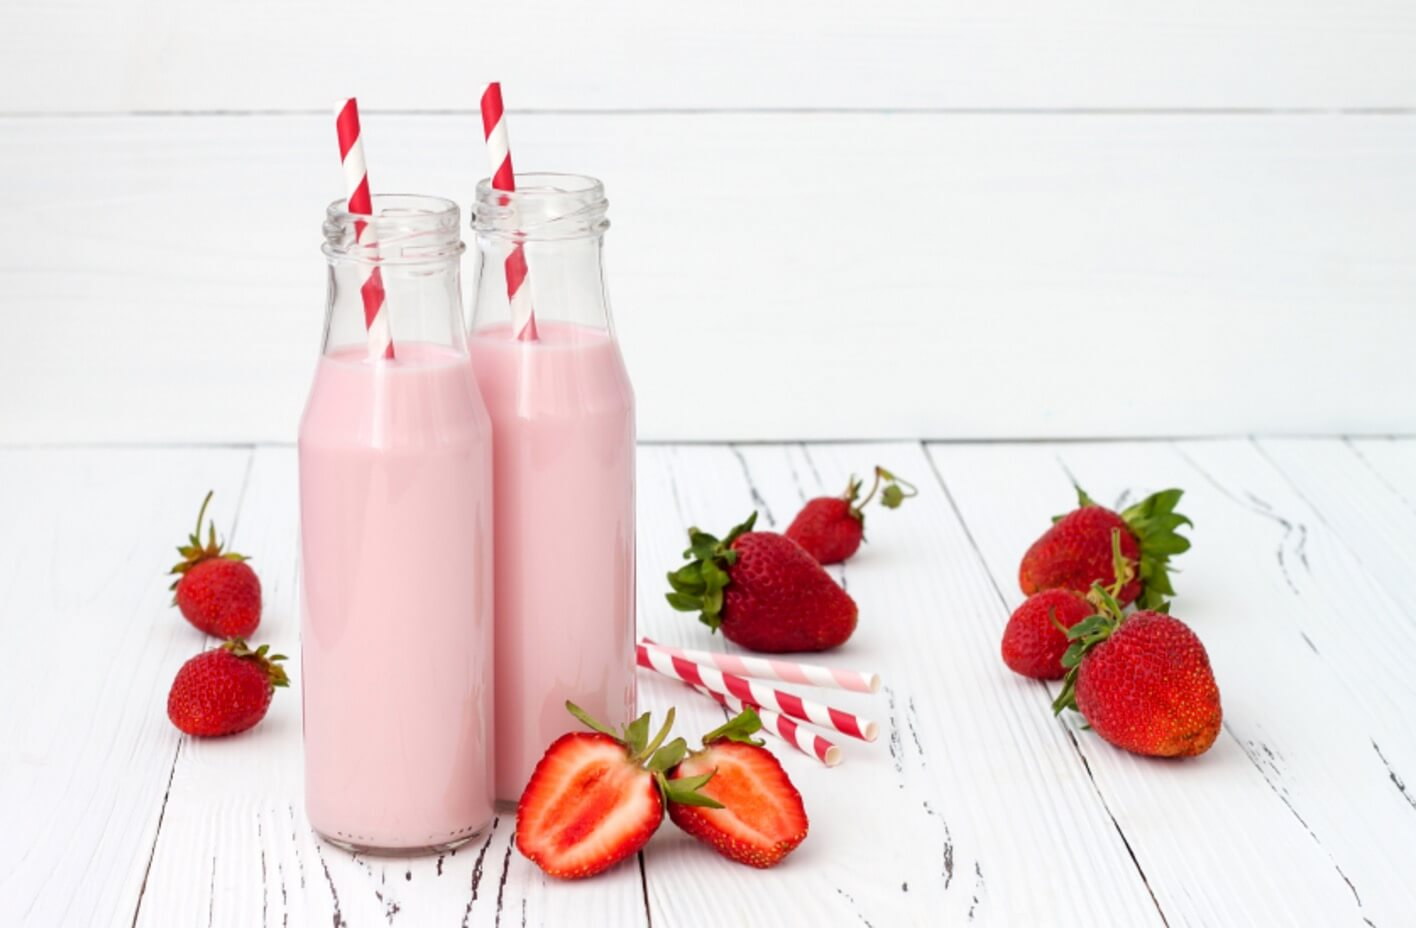 Recetas para hacer batidos con pocas calorías ideales para dietas